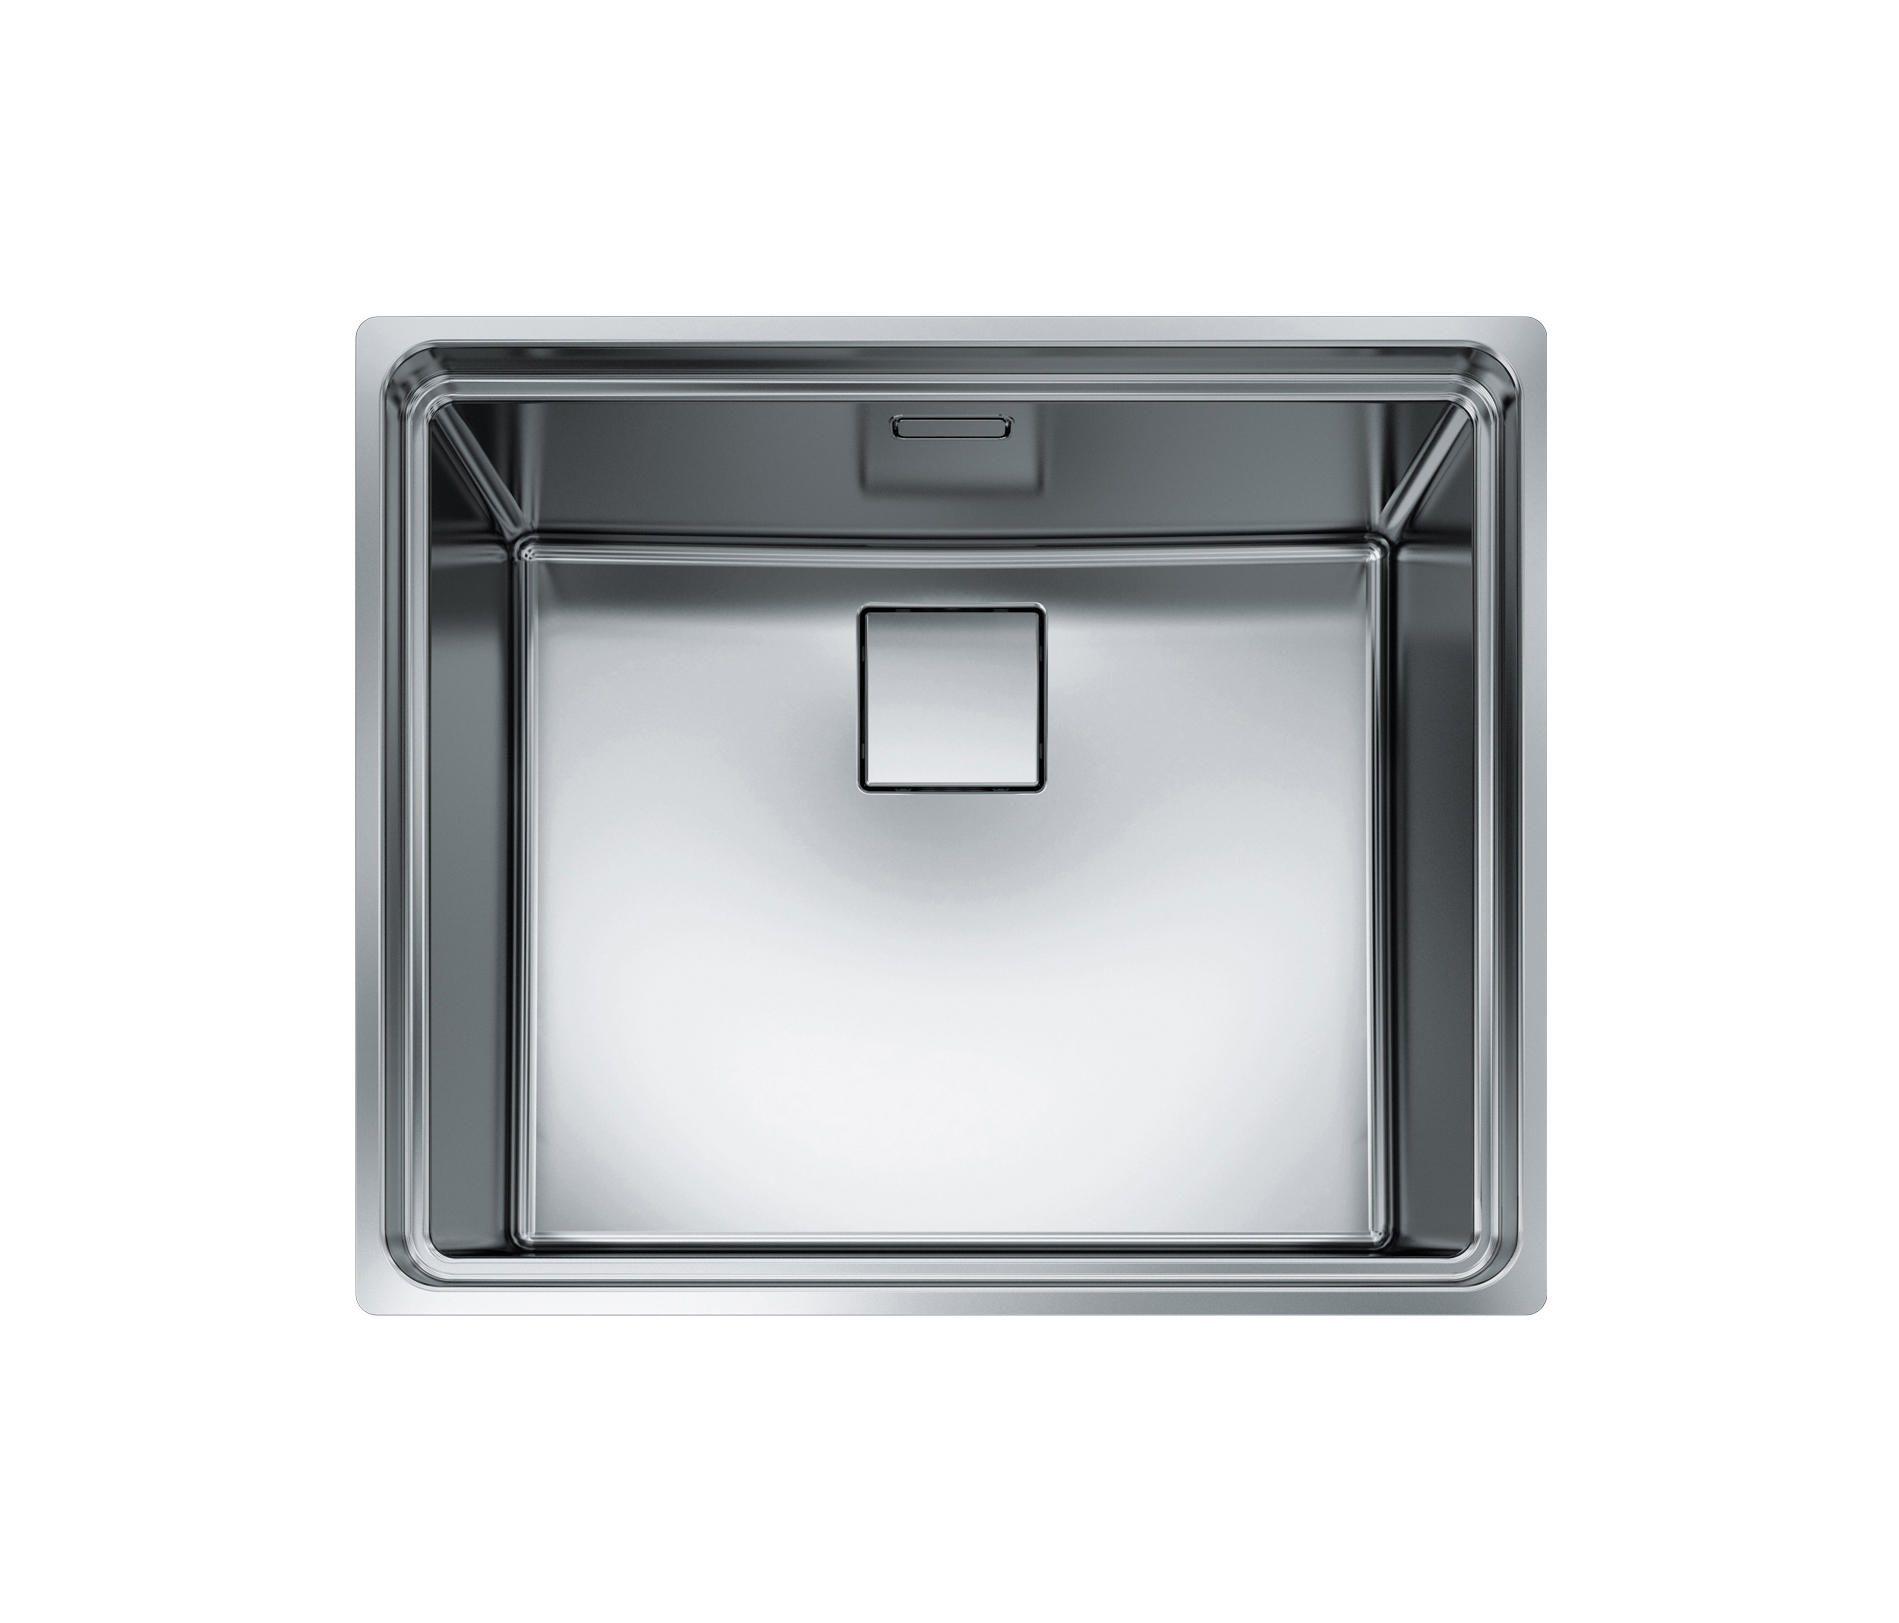 Superieur Franke Composite Sink Reviews | Kitchen Sinks At Lowes | Franke Kitchen  Sinks